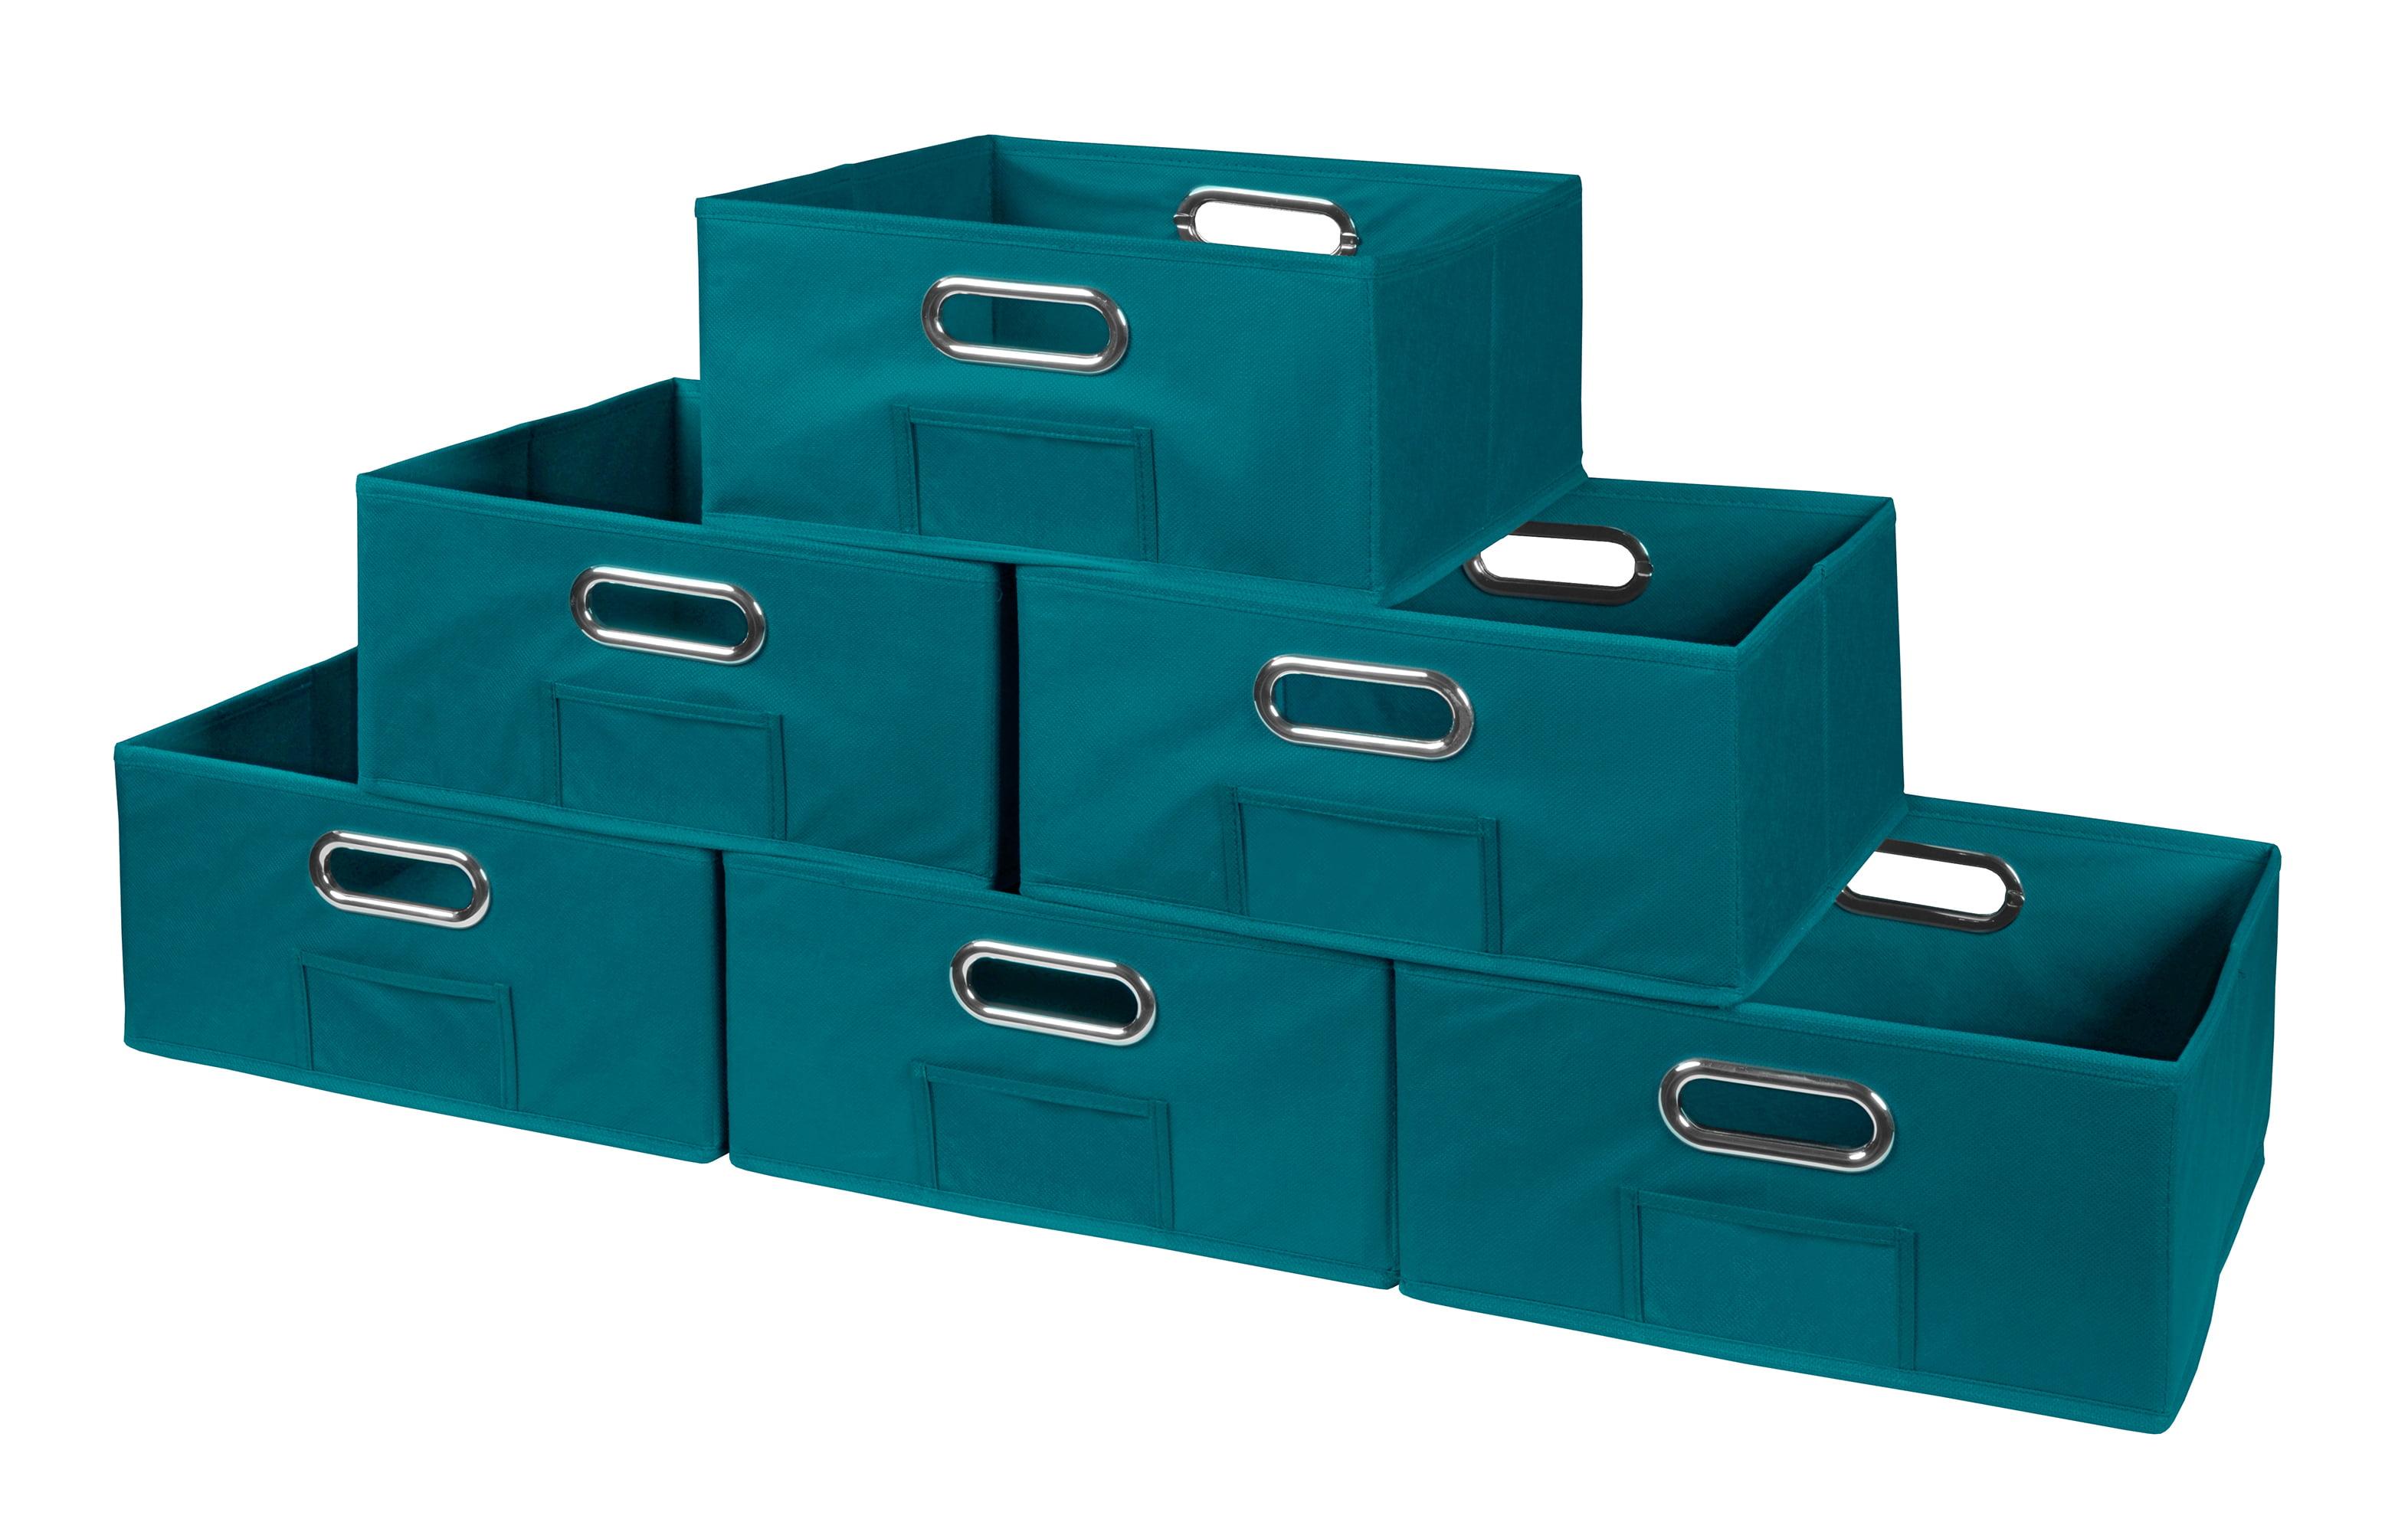 Niche Cubo Set of 6 Half-Size Foldable Fabric Storage Bins- Blue by Regency